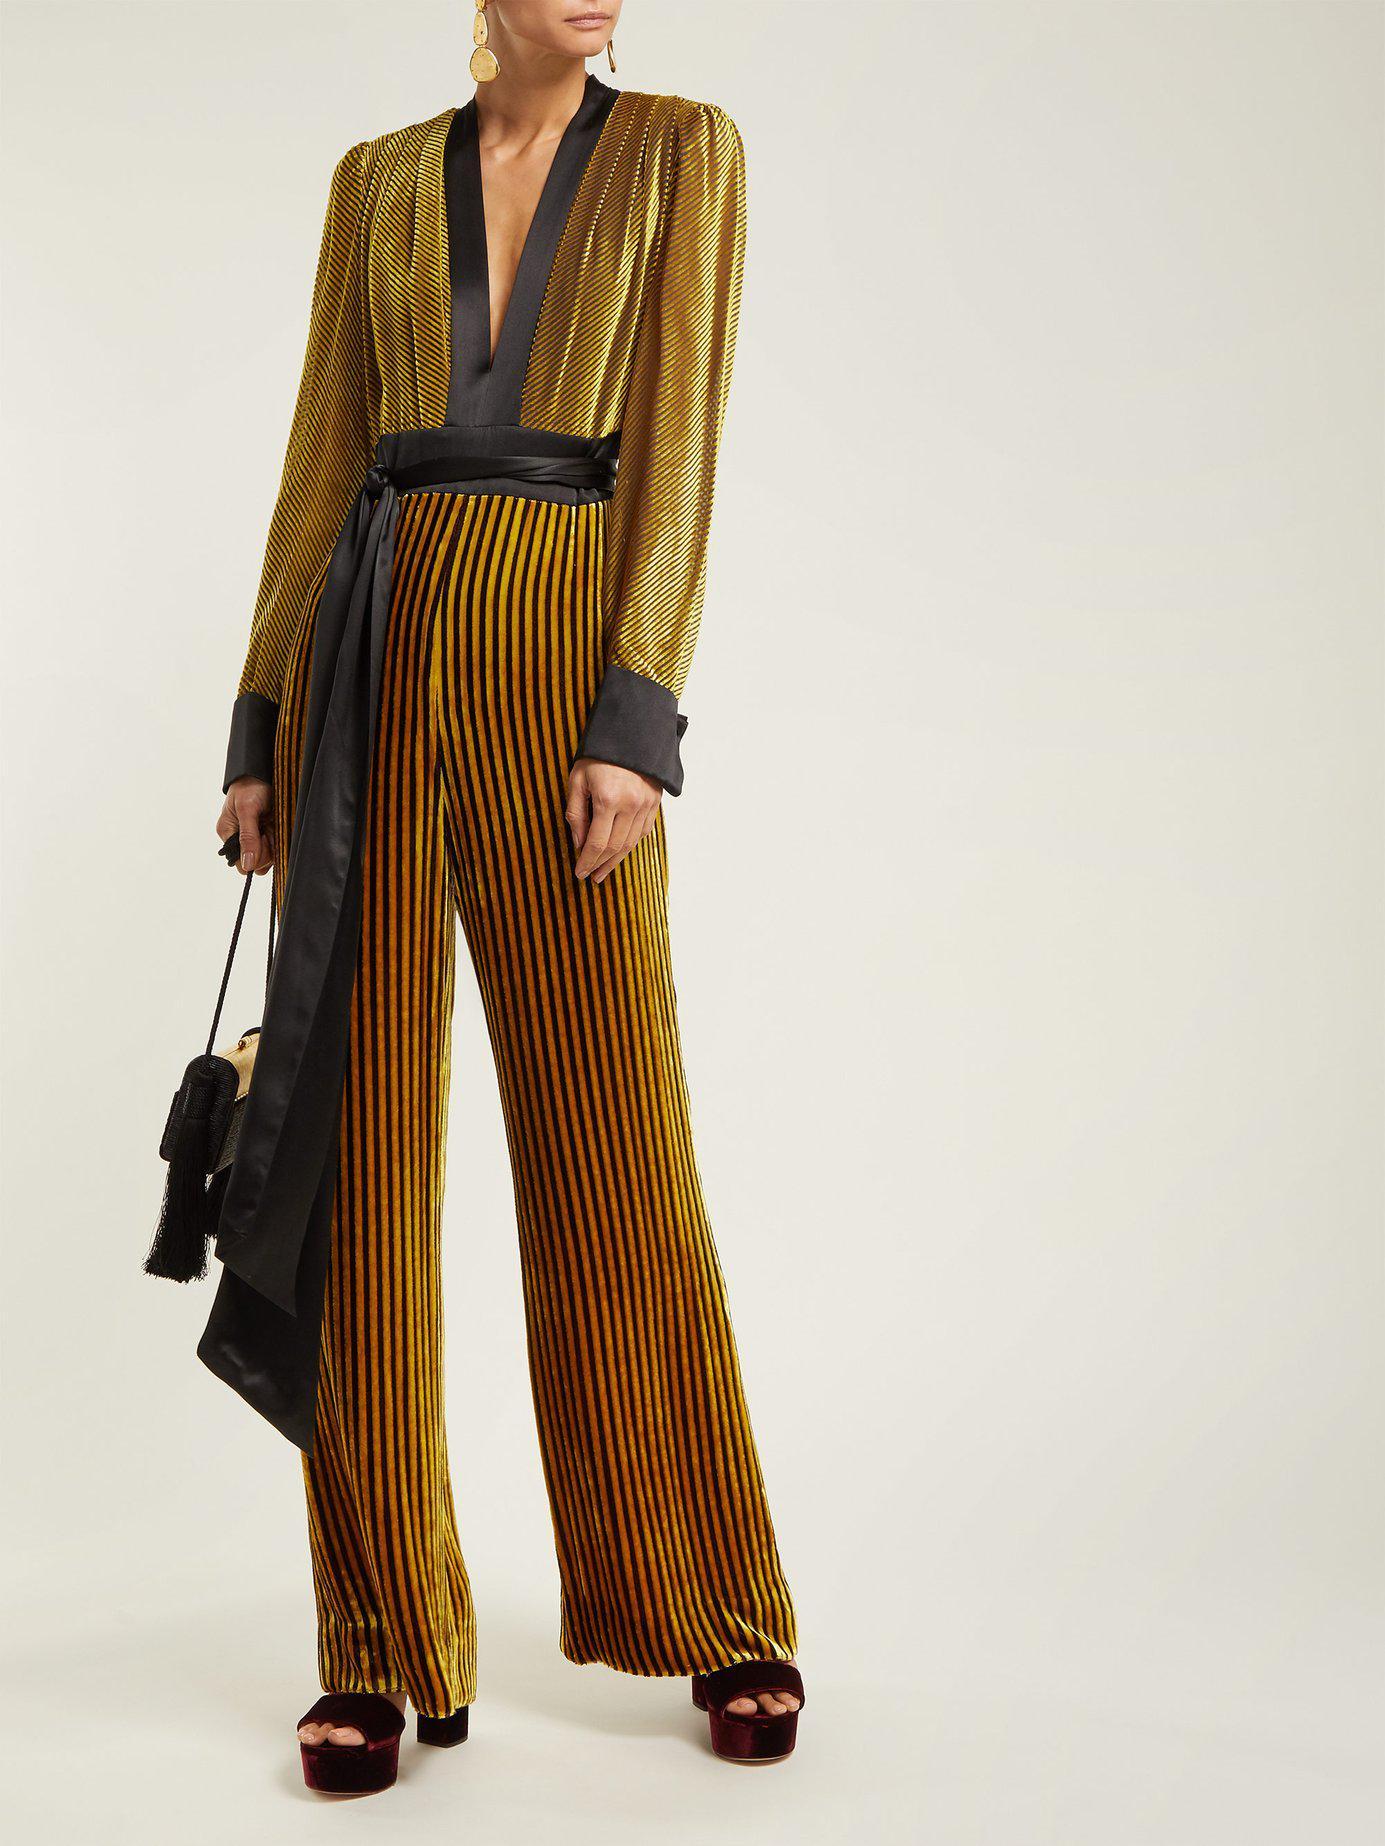 Diane Von Furstenberg Satin Trimmed Striped Velvet Jumpsuit In Black Gold Black Lyst